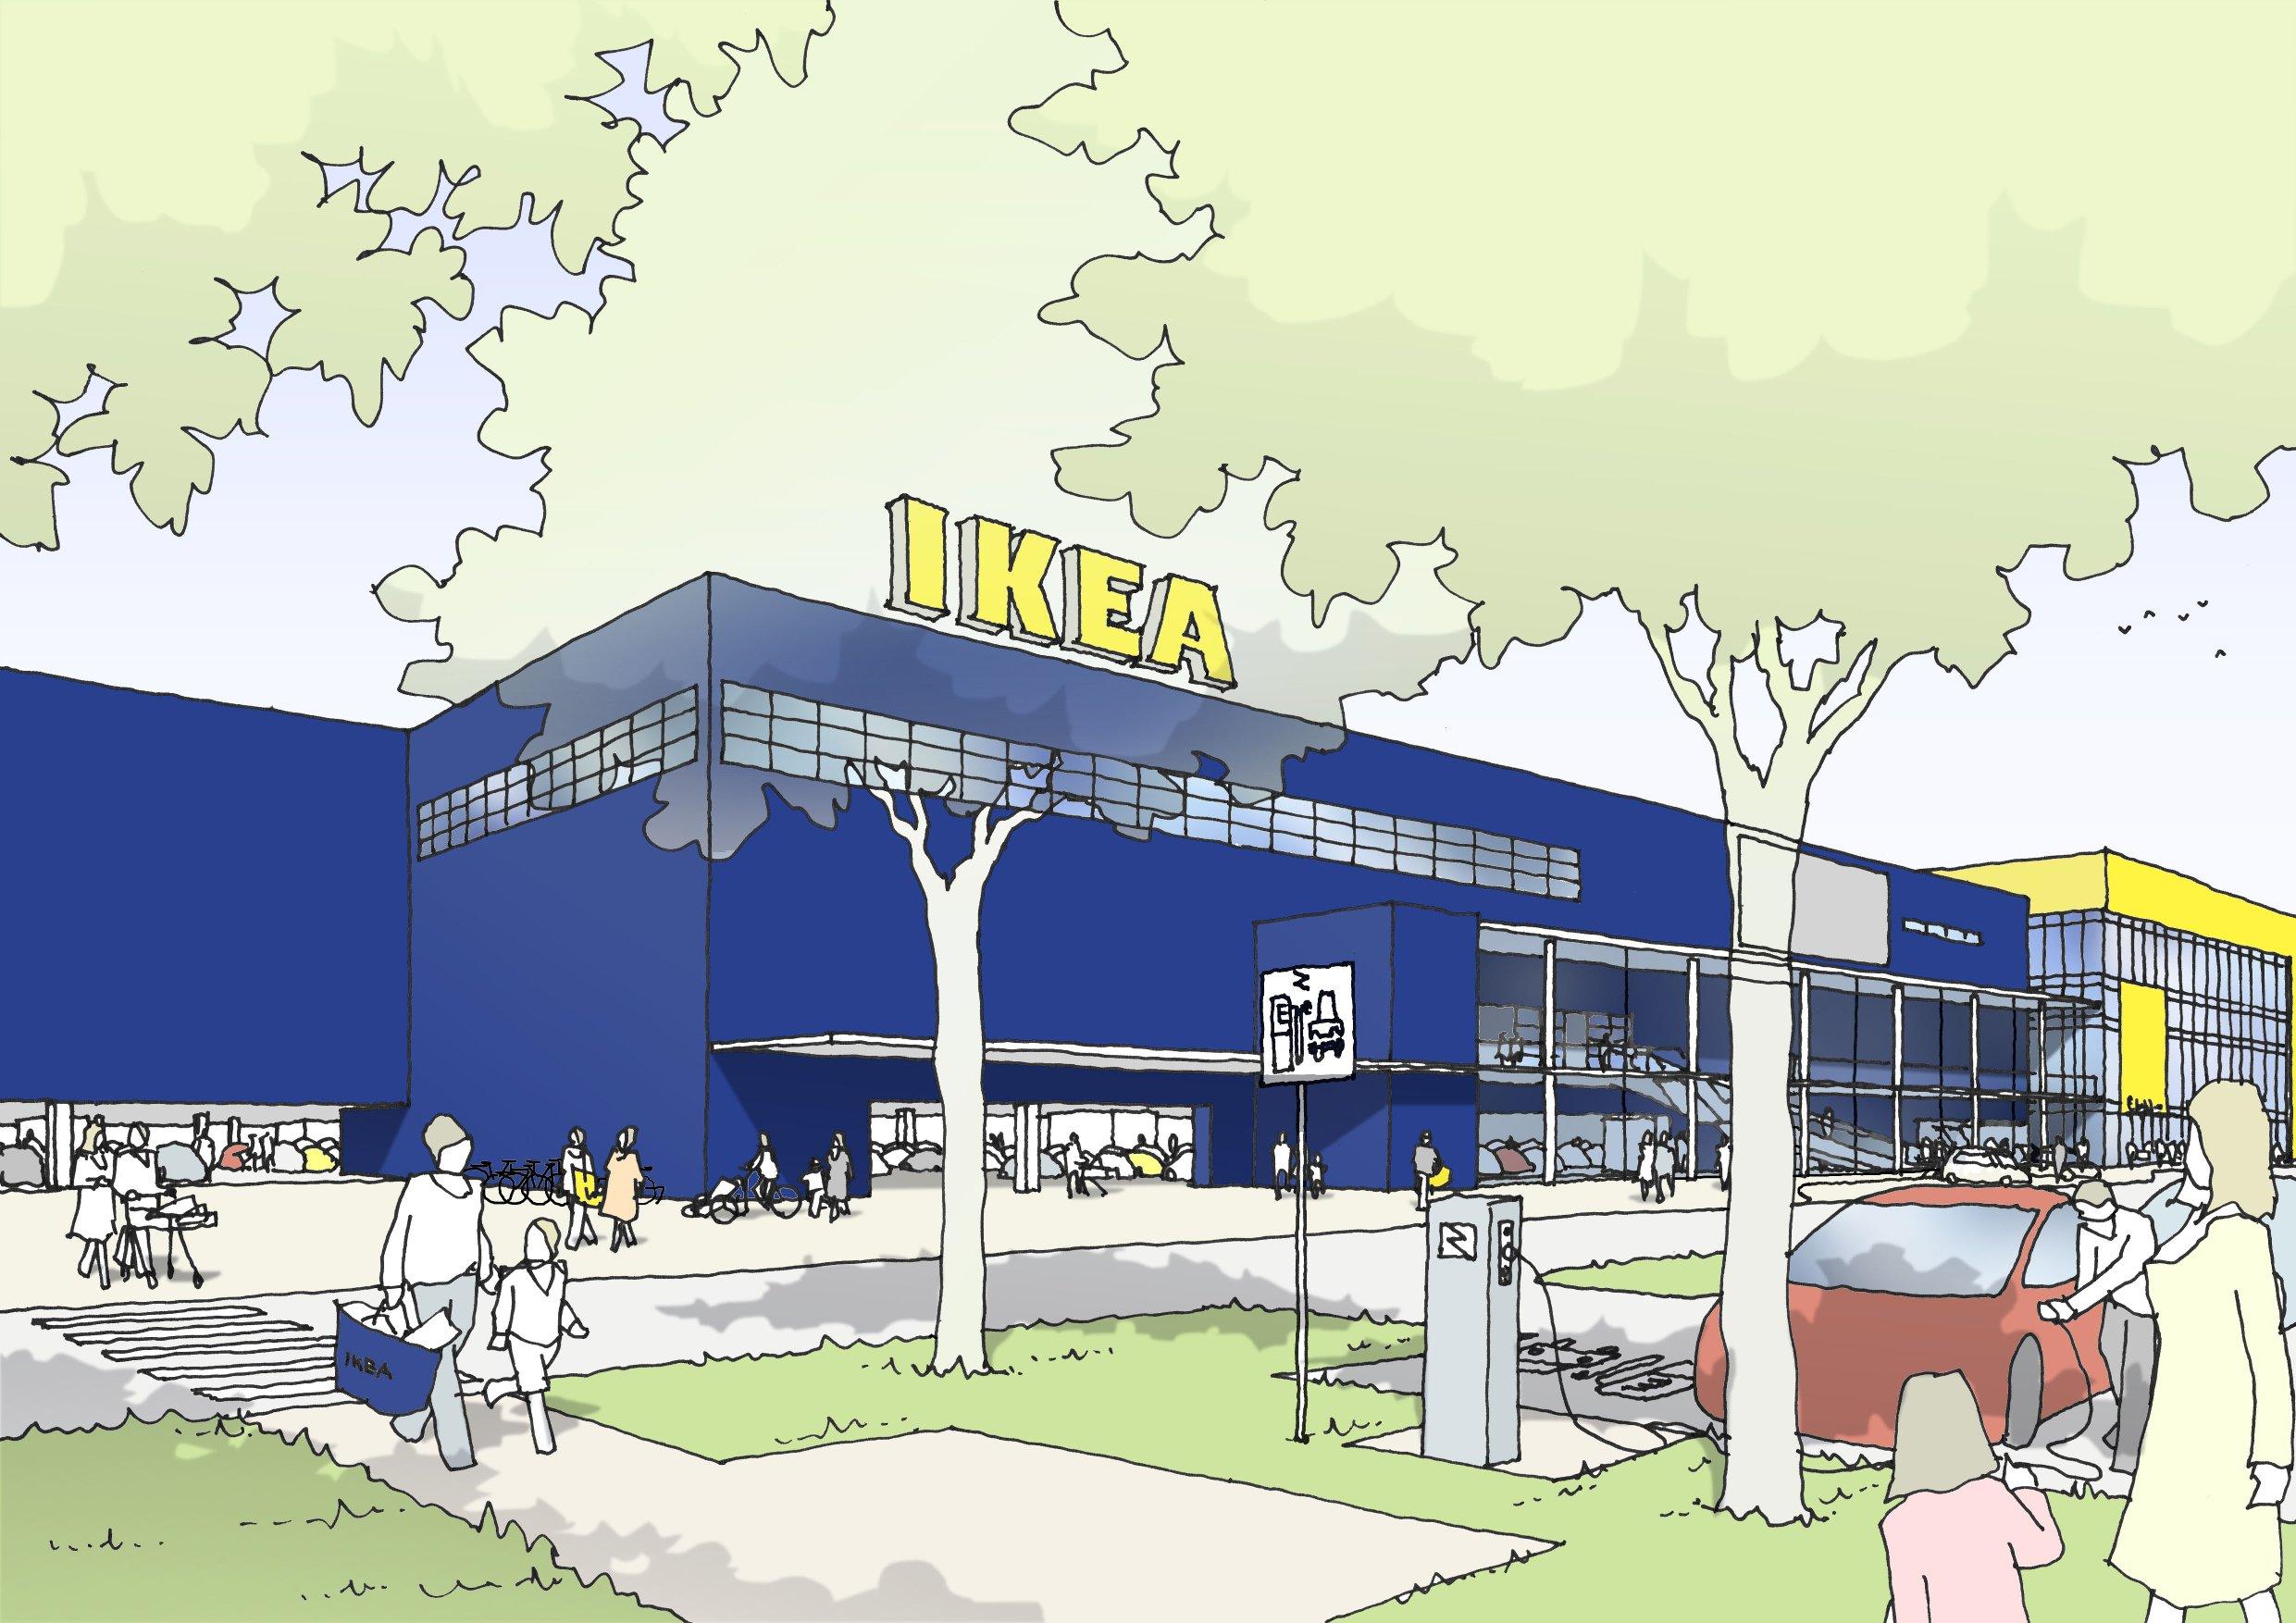 Ikea Nürnberg Regensburger Straße